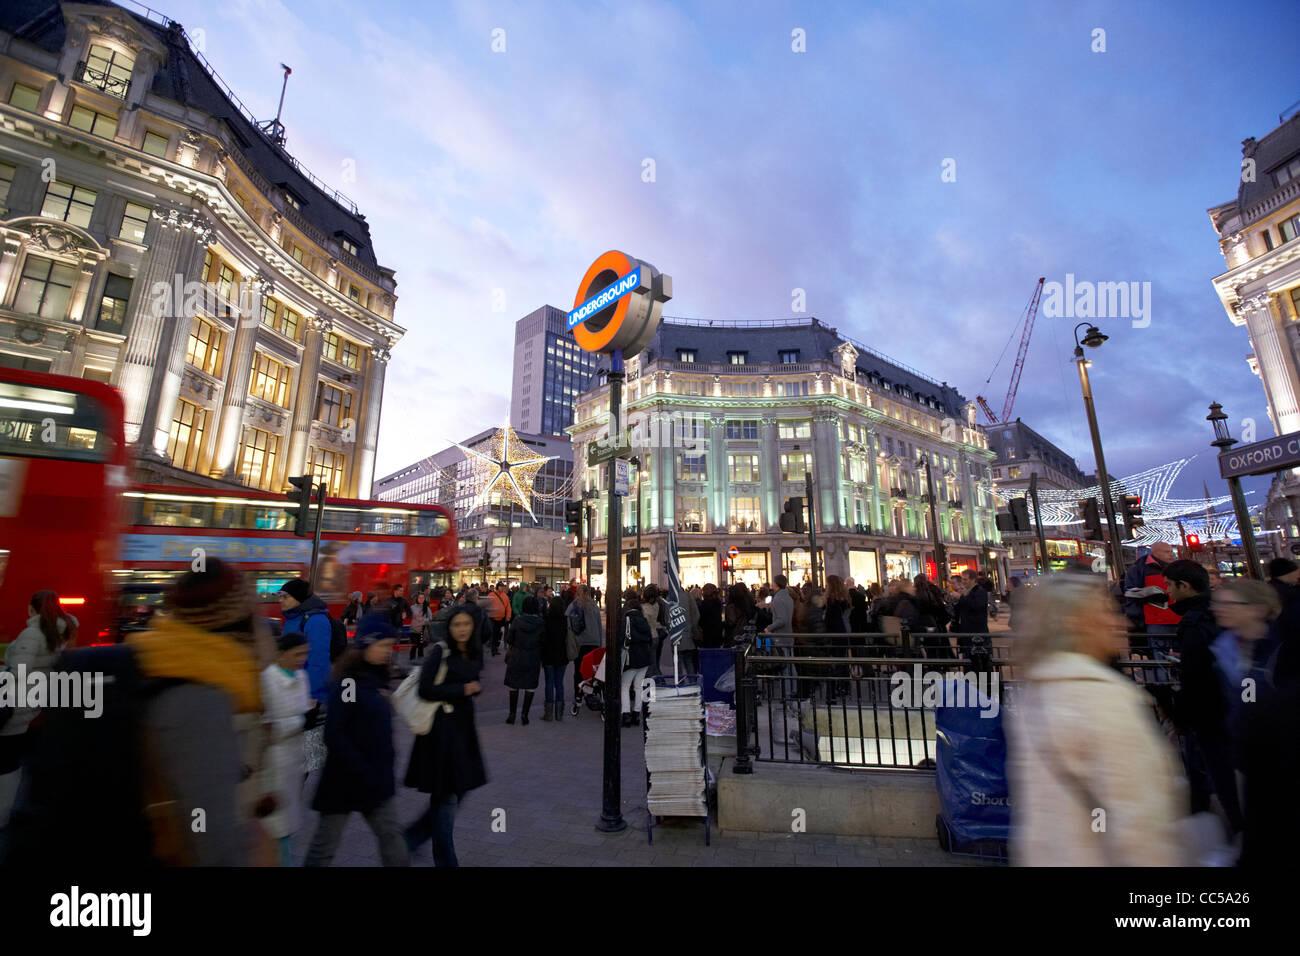 beschäftigt Eingang zum Oxford Circus u-Bahn-Station am Abend Hauptverkehrszeit London England UK-Vereinigtes Stockbild